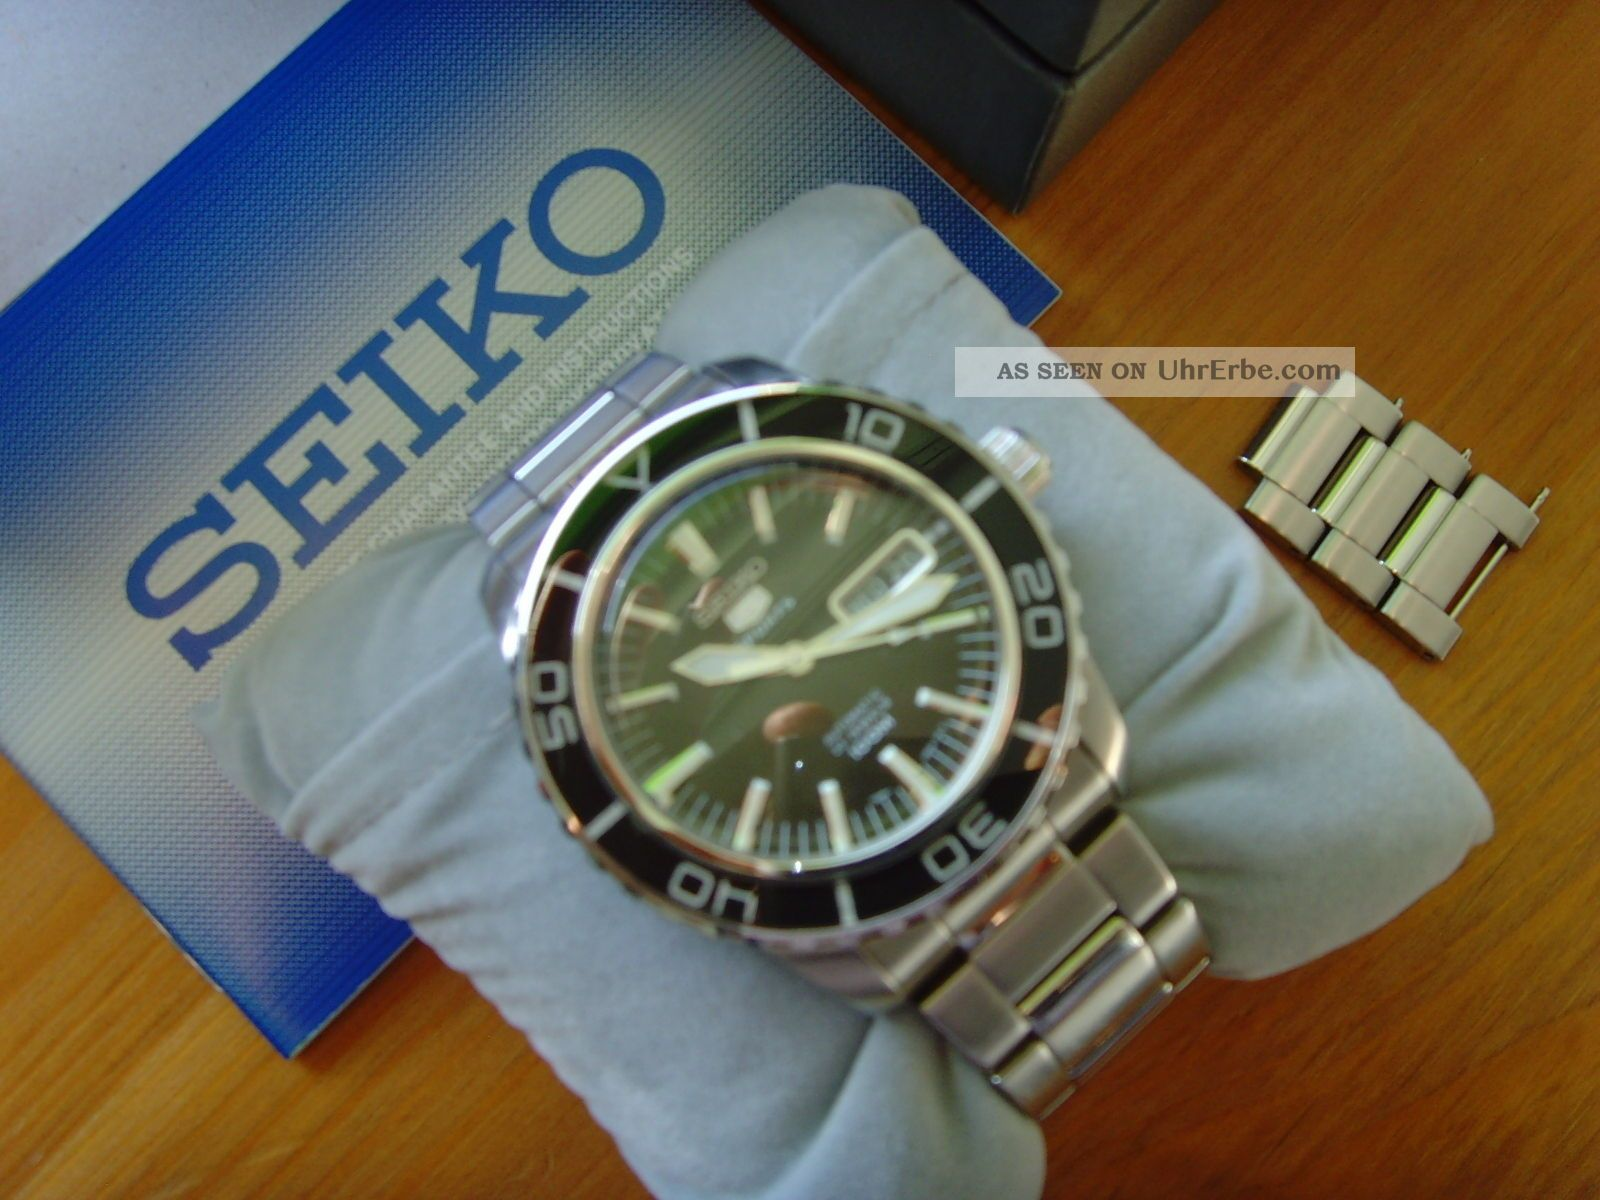 Seiko 5 Sports Snzh55k1 Herrenuhr Armbanduhr Automatik Ovp Armbanduhren Bild